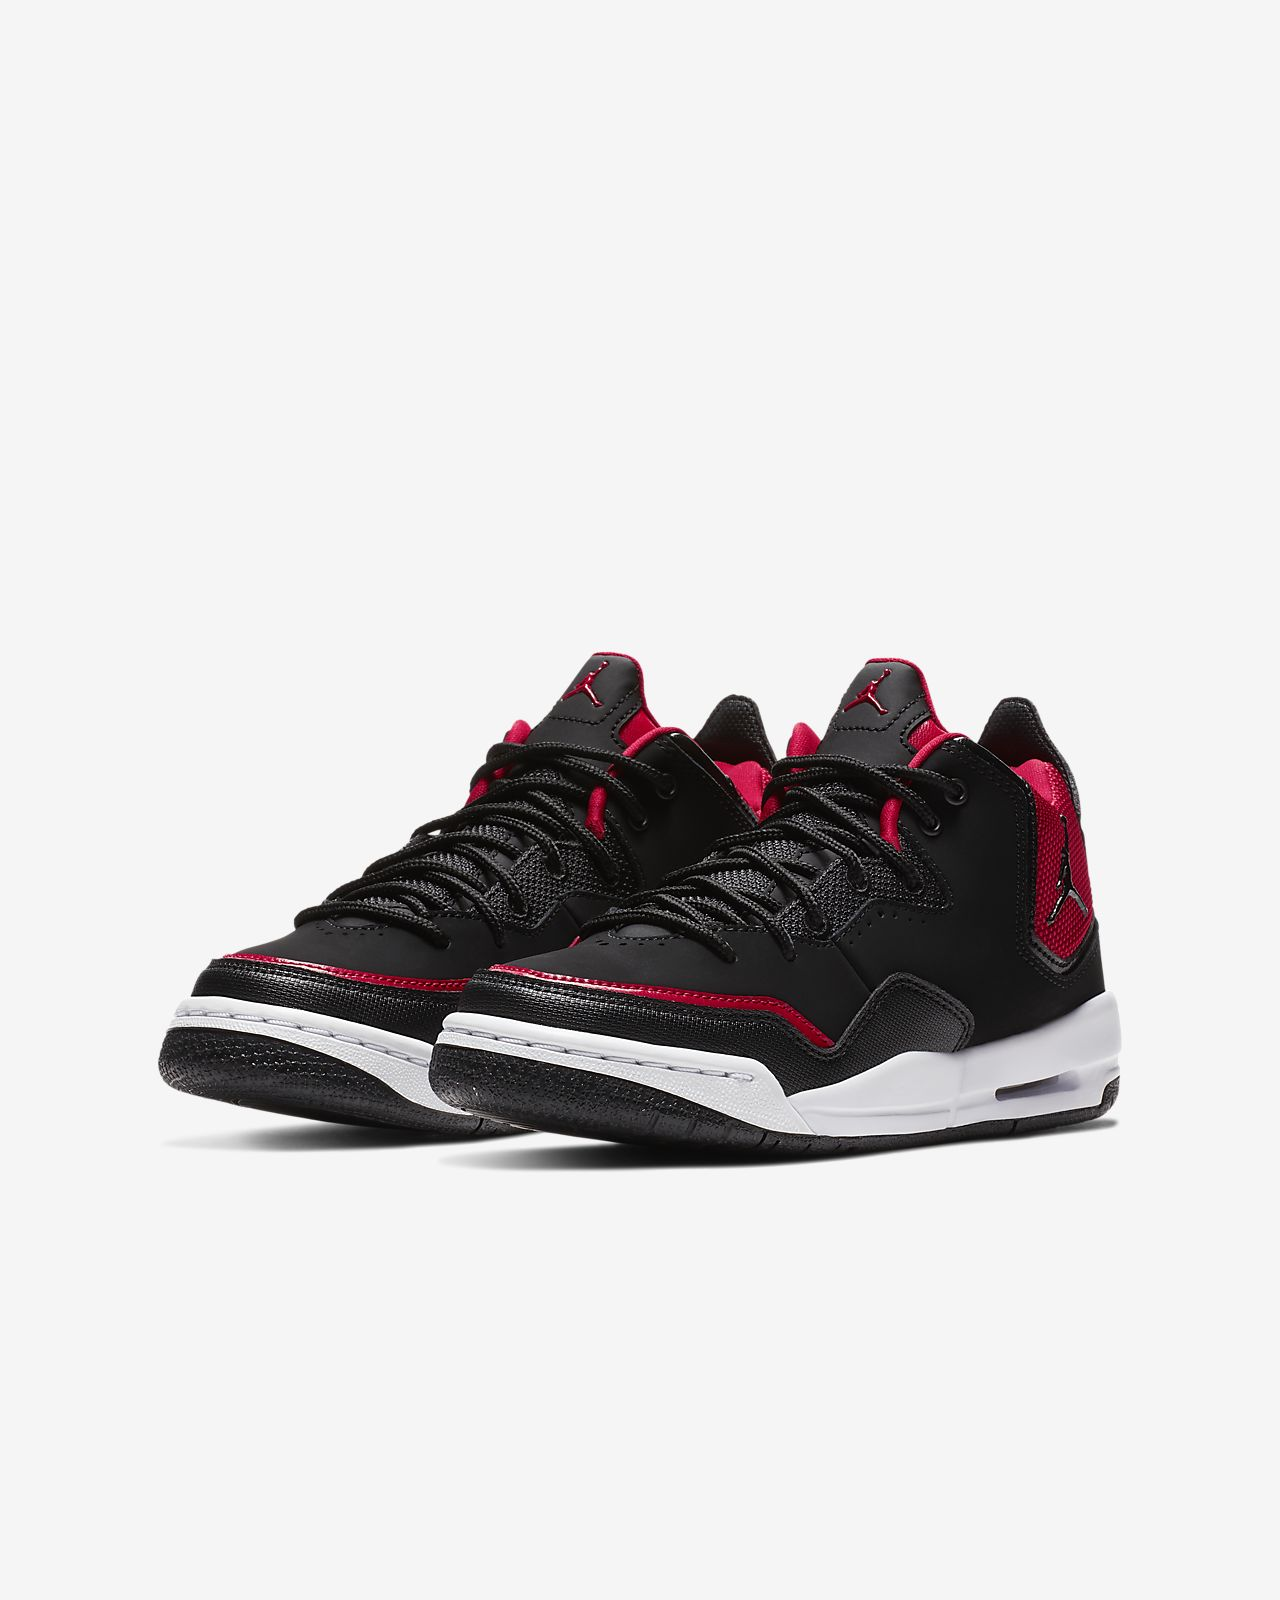 81f94978759c Jordan Courtside 23 Older Kids  Shoe. Nike.com CA